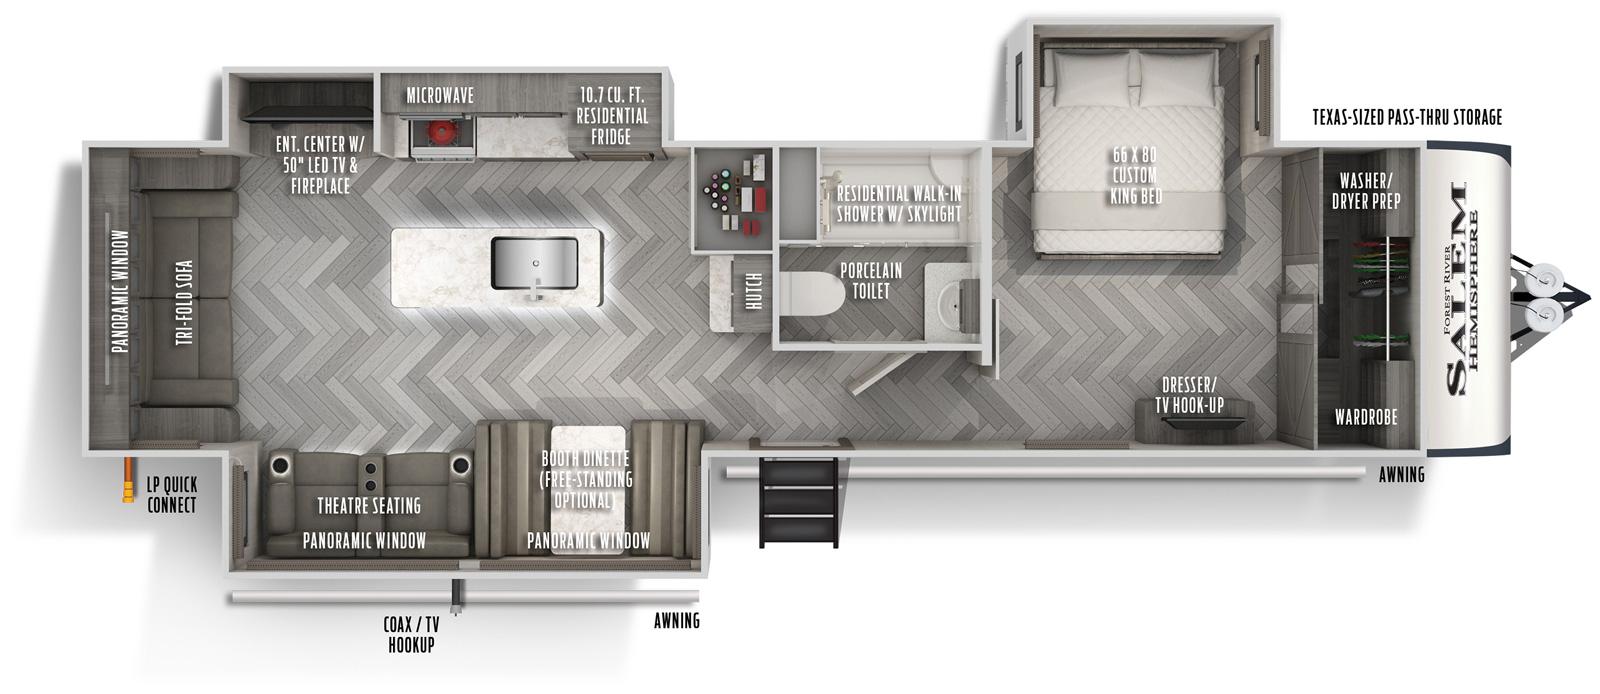 Floorplan of the 2020 Forest River Salem Hemisphere Travel Trailer